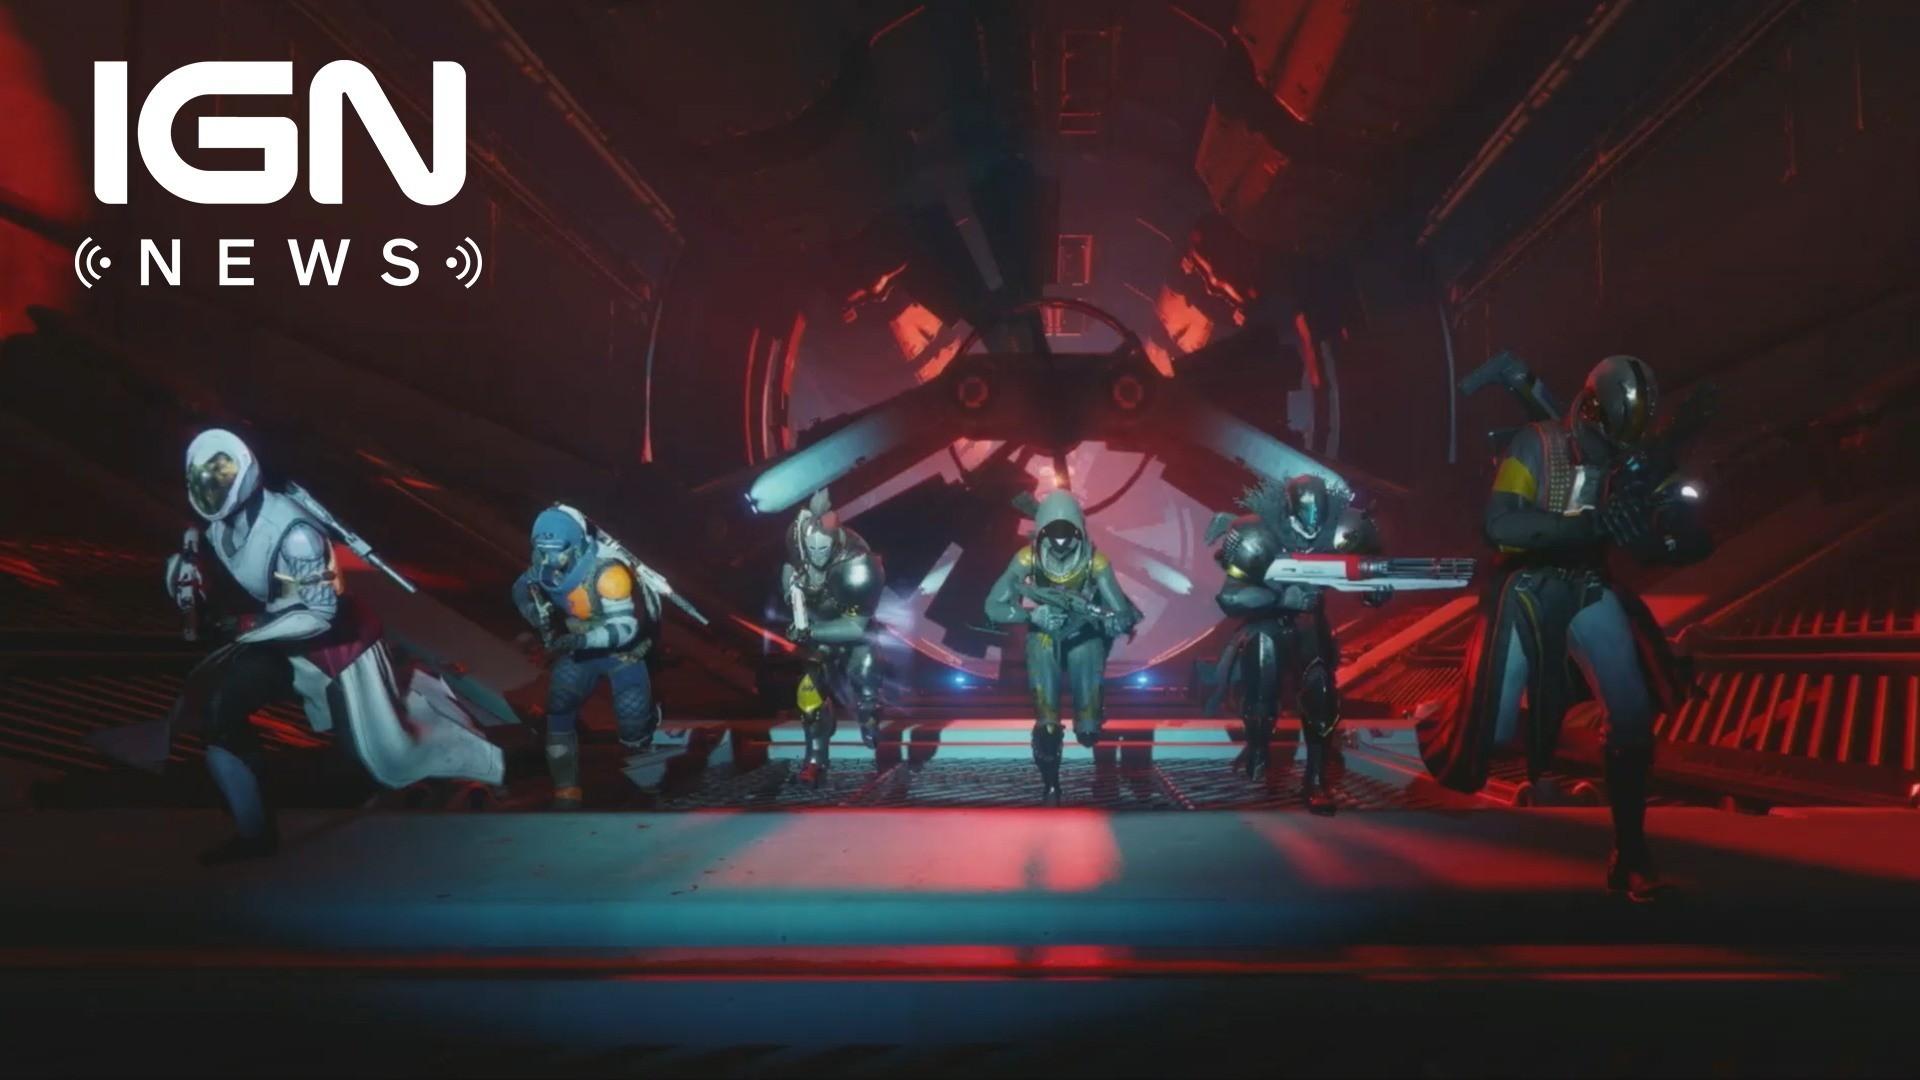 Destiny 2 PC Version Available Exclusively Through Blizzard's Battle.net –  IGN